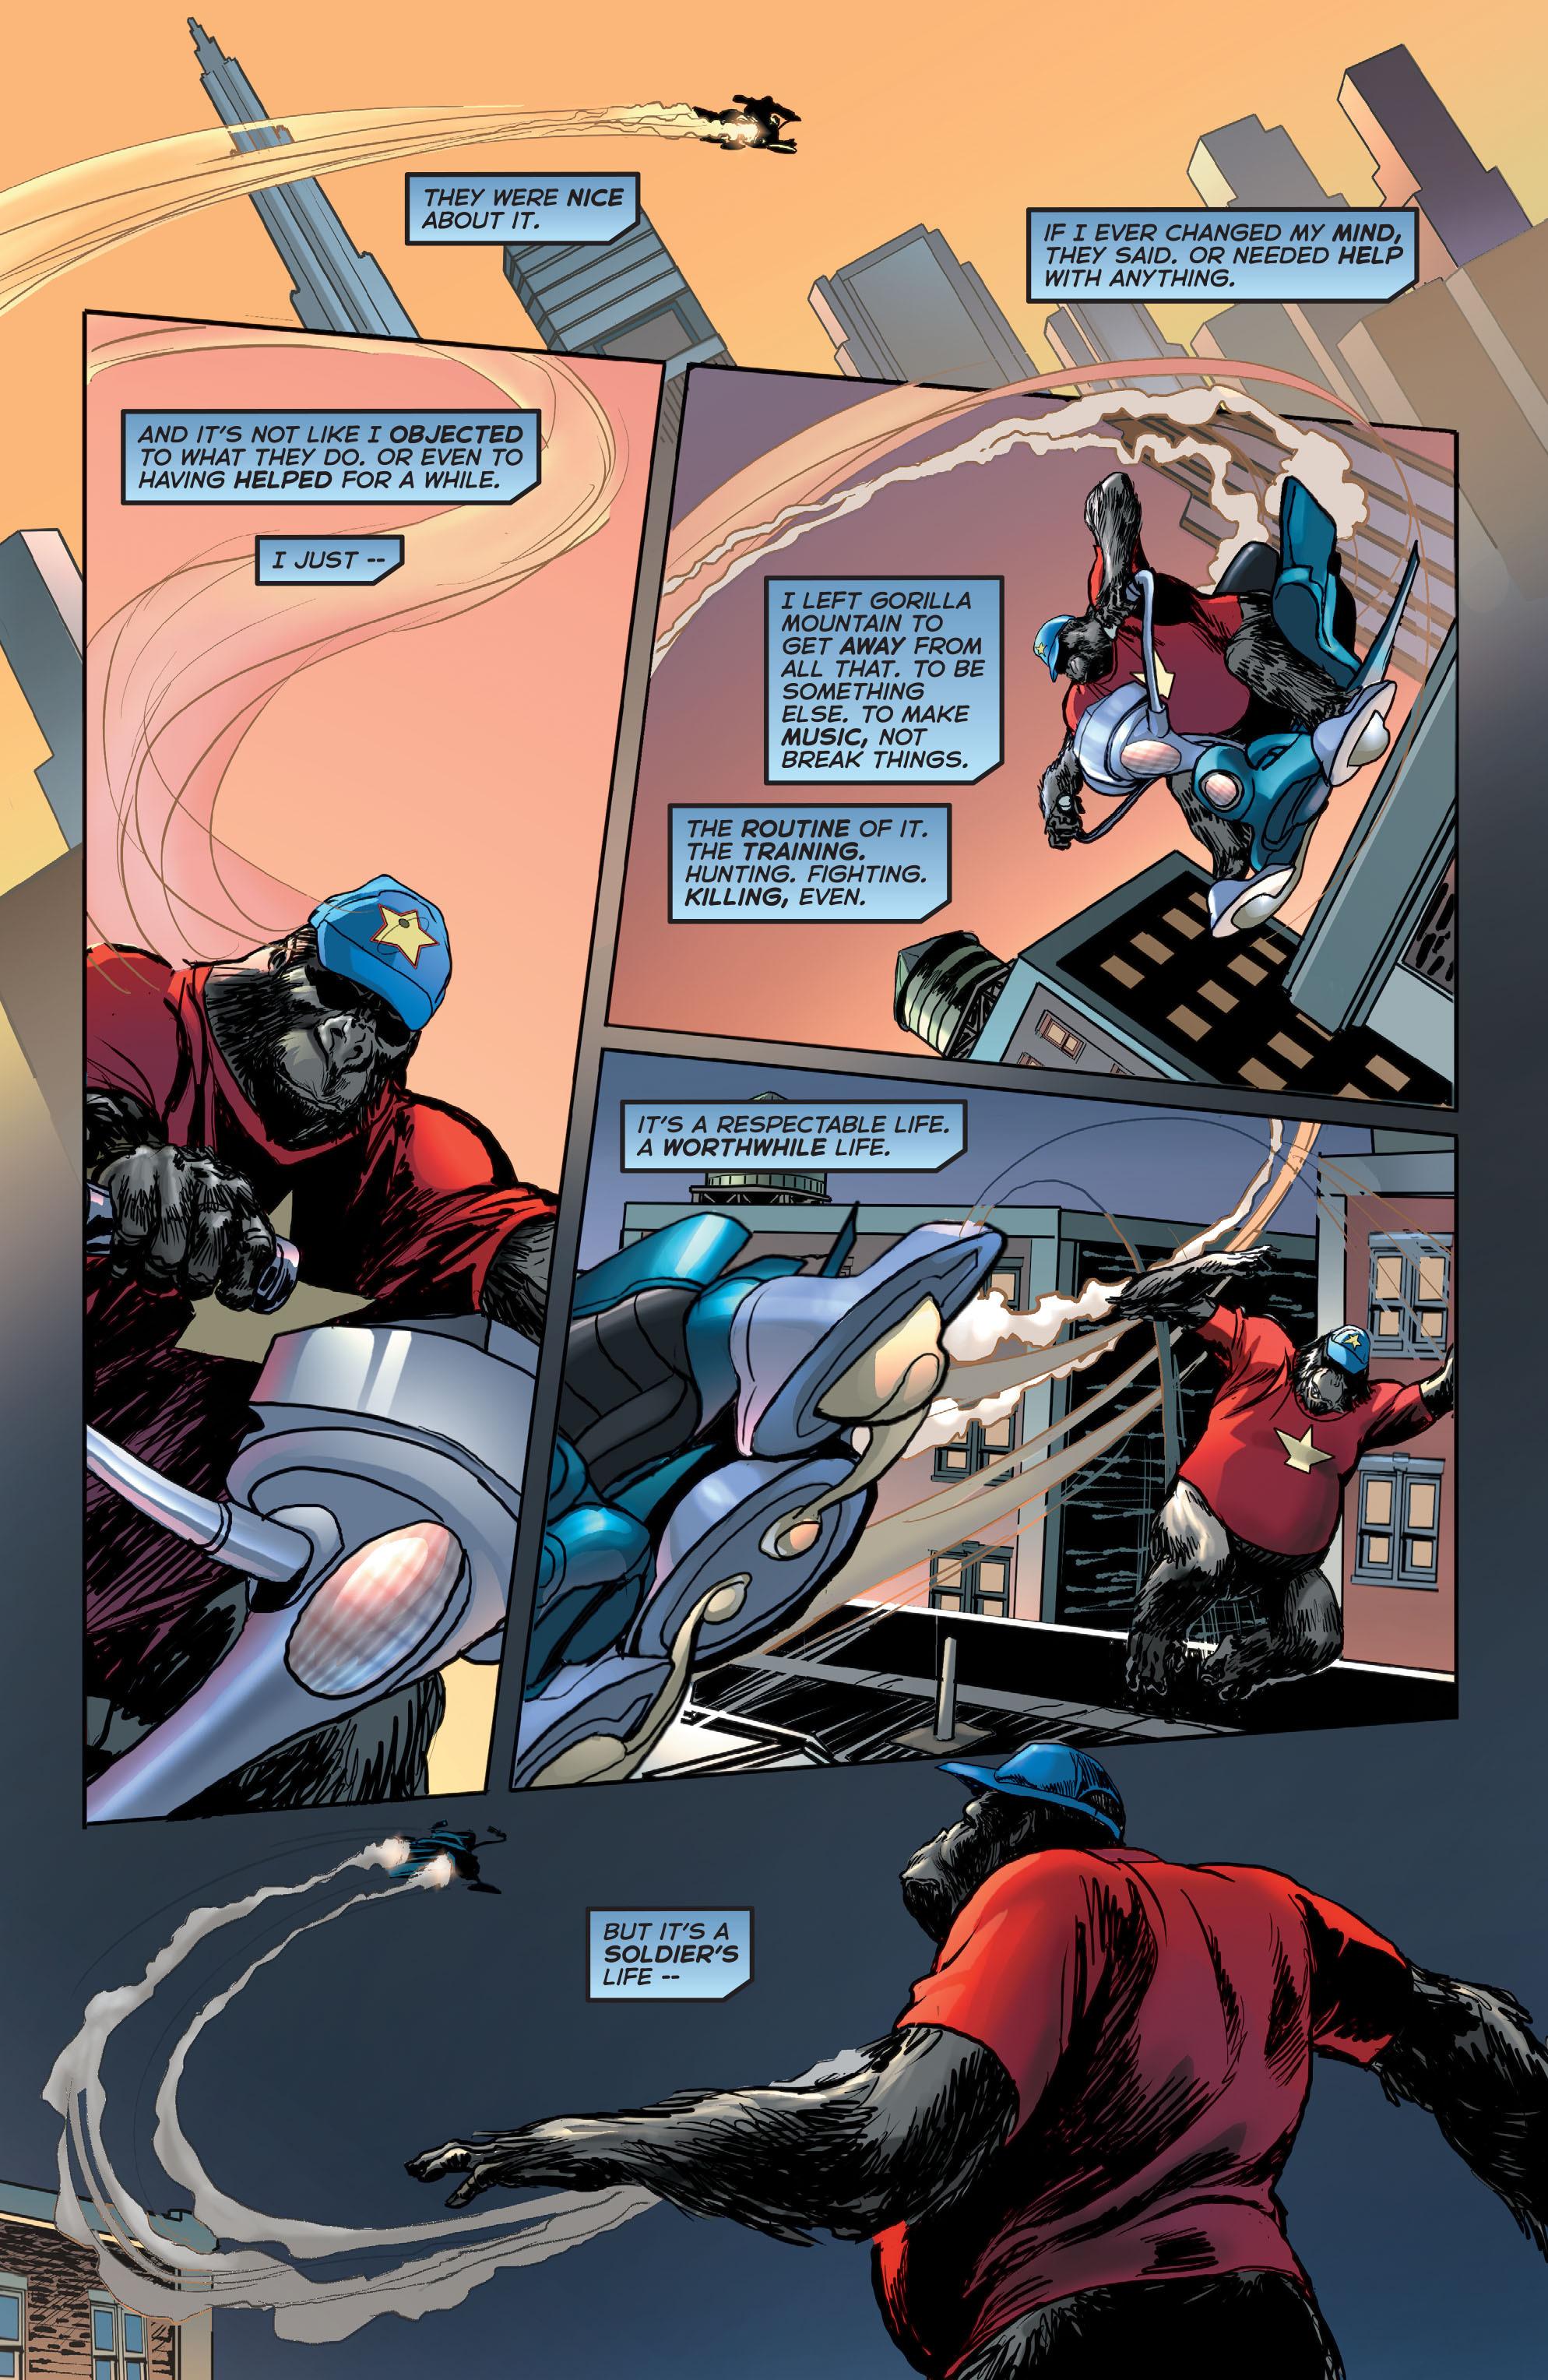 Read online Astro City comic -  Issue #24 - 11